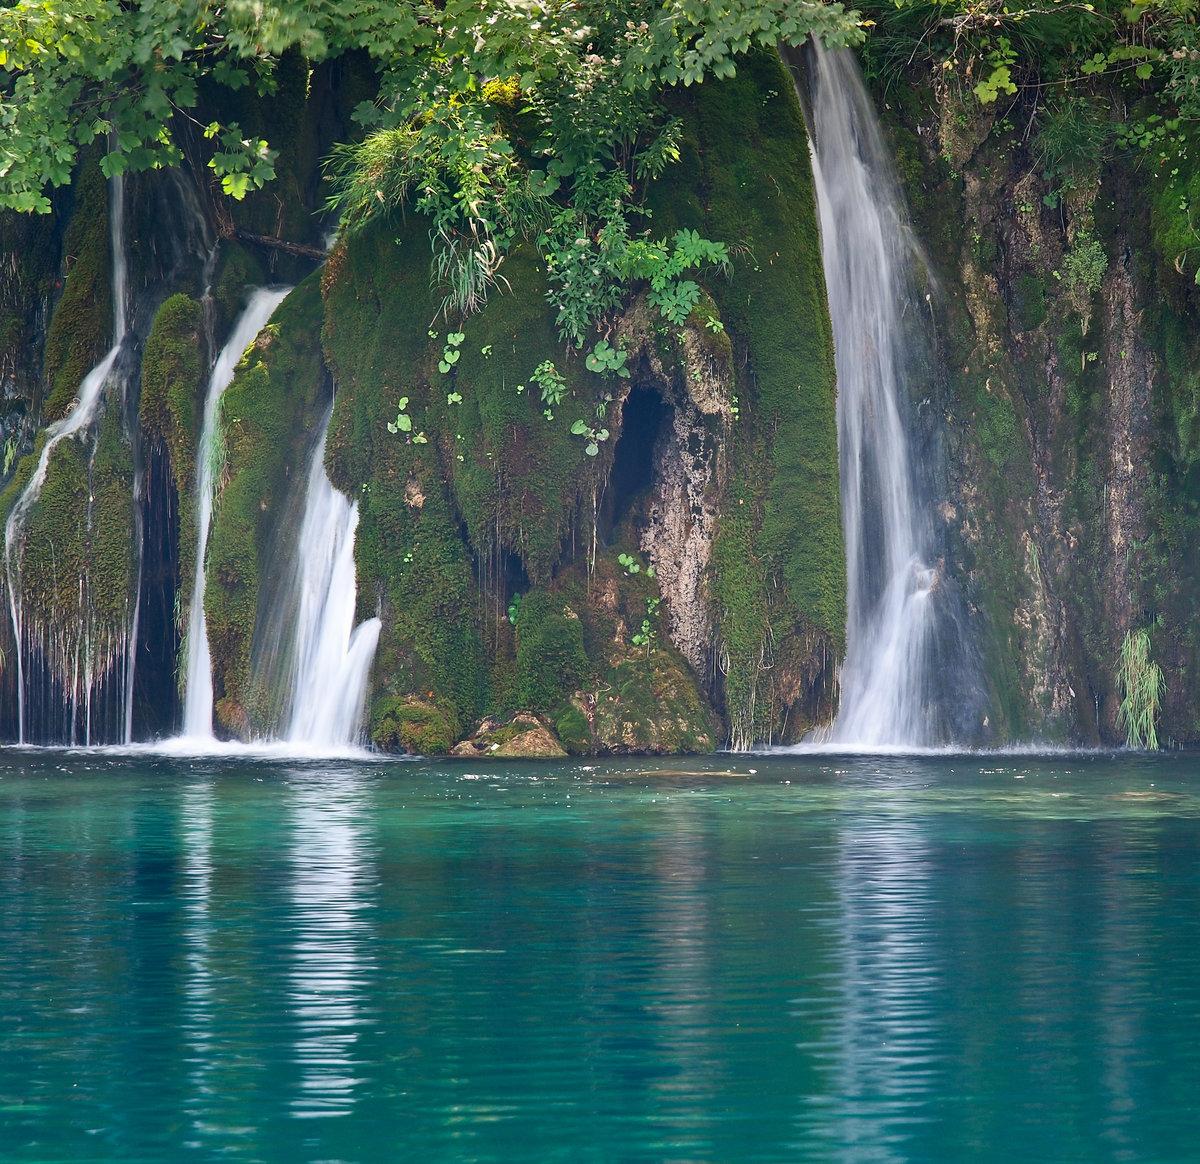 Юбилей, картинка водопад анимация